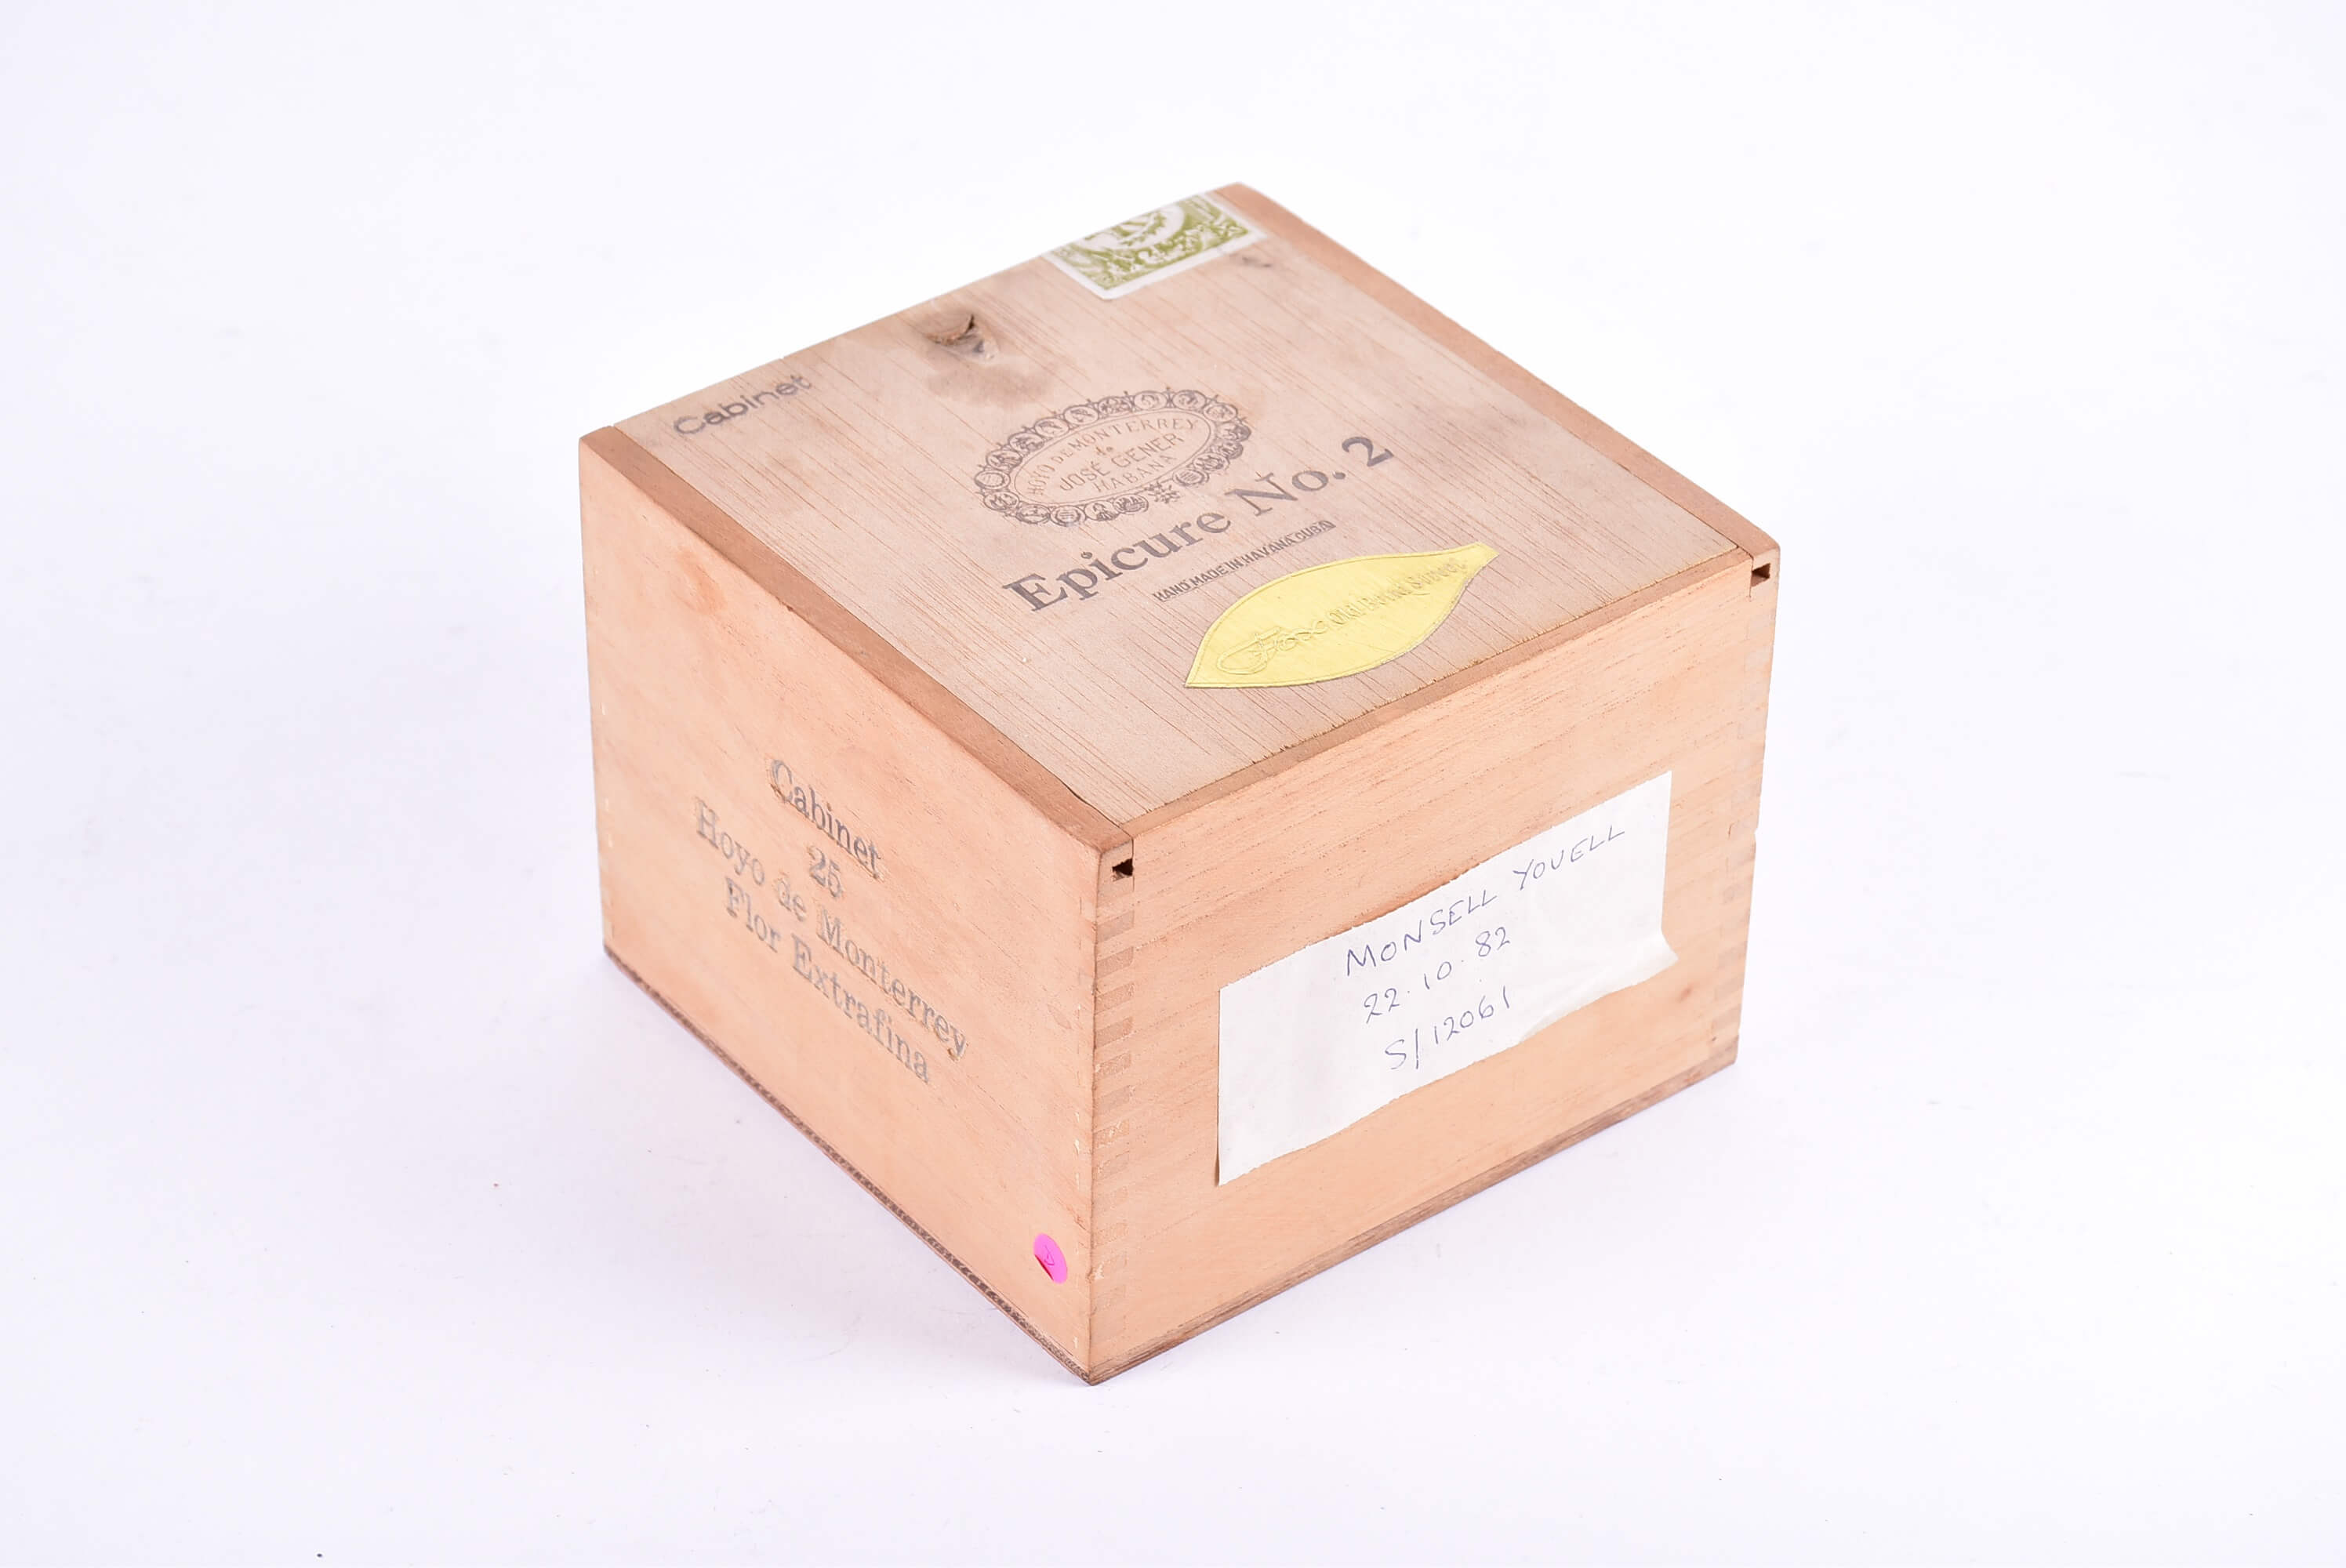 A box of Jose Gener Havana Epicure No 2 cigars